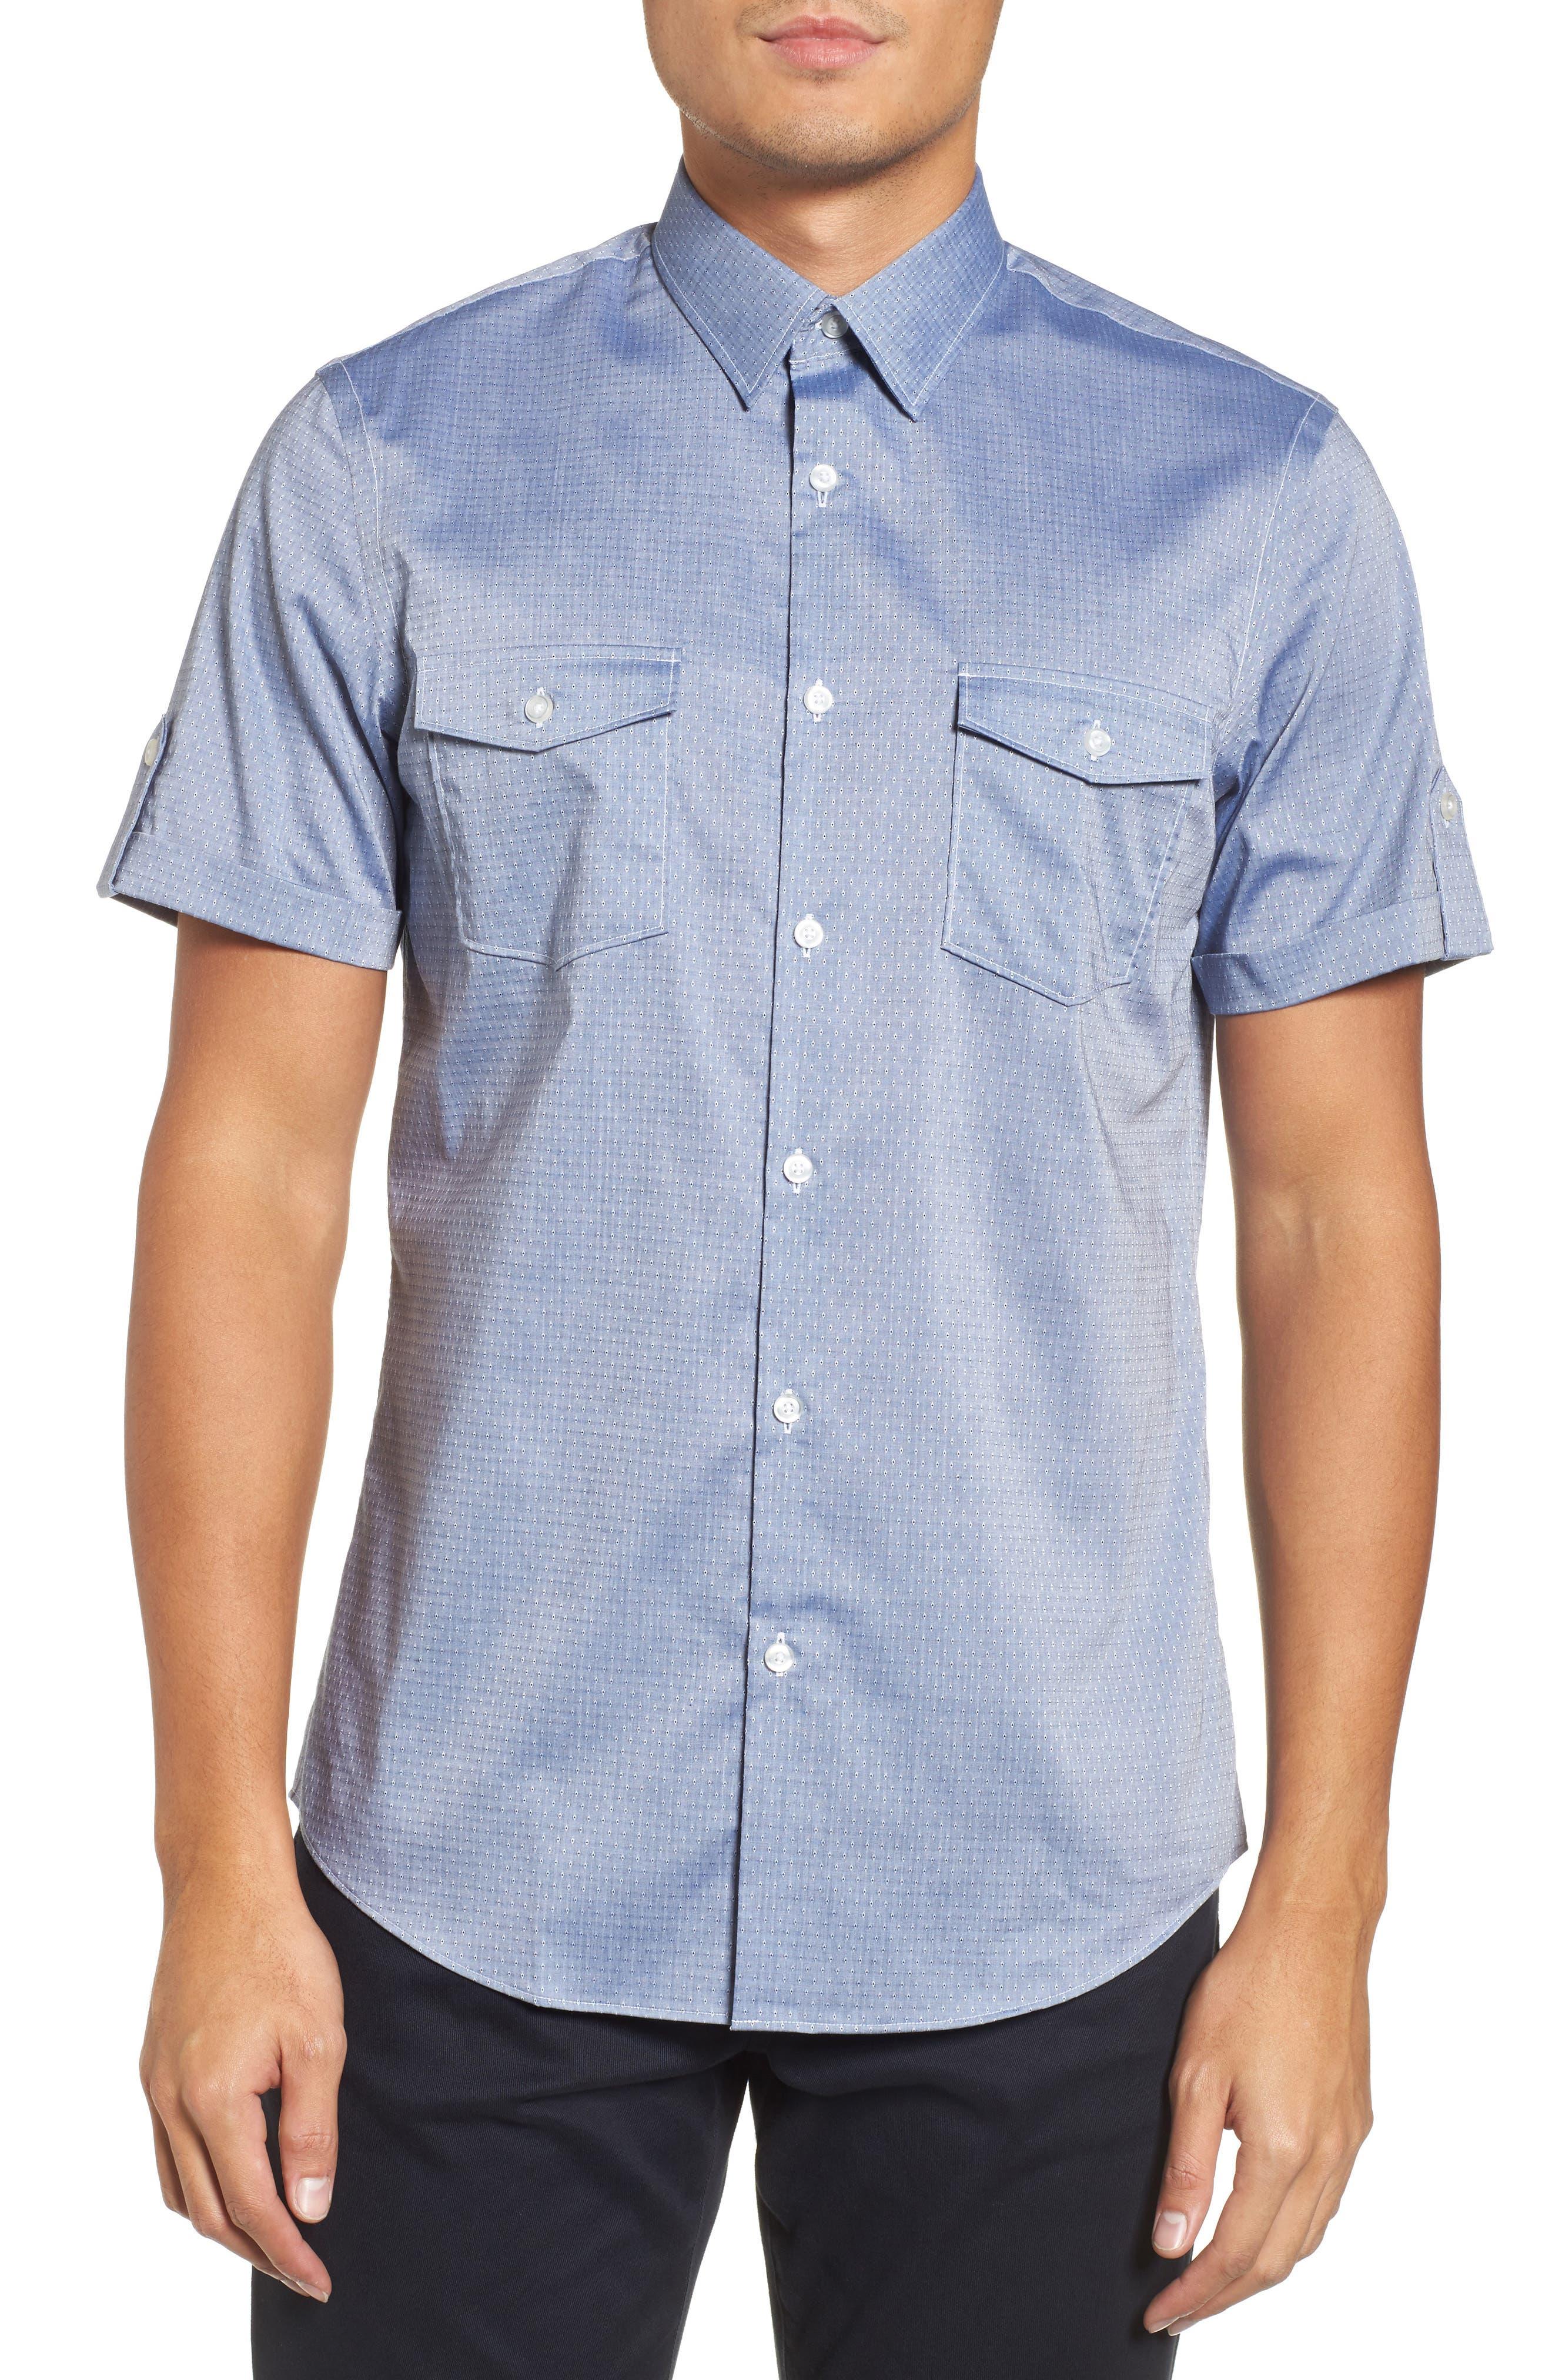 Dobby Military Shirt,                         Main,                         color, Blue Vintage Eoe Dobby